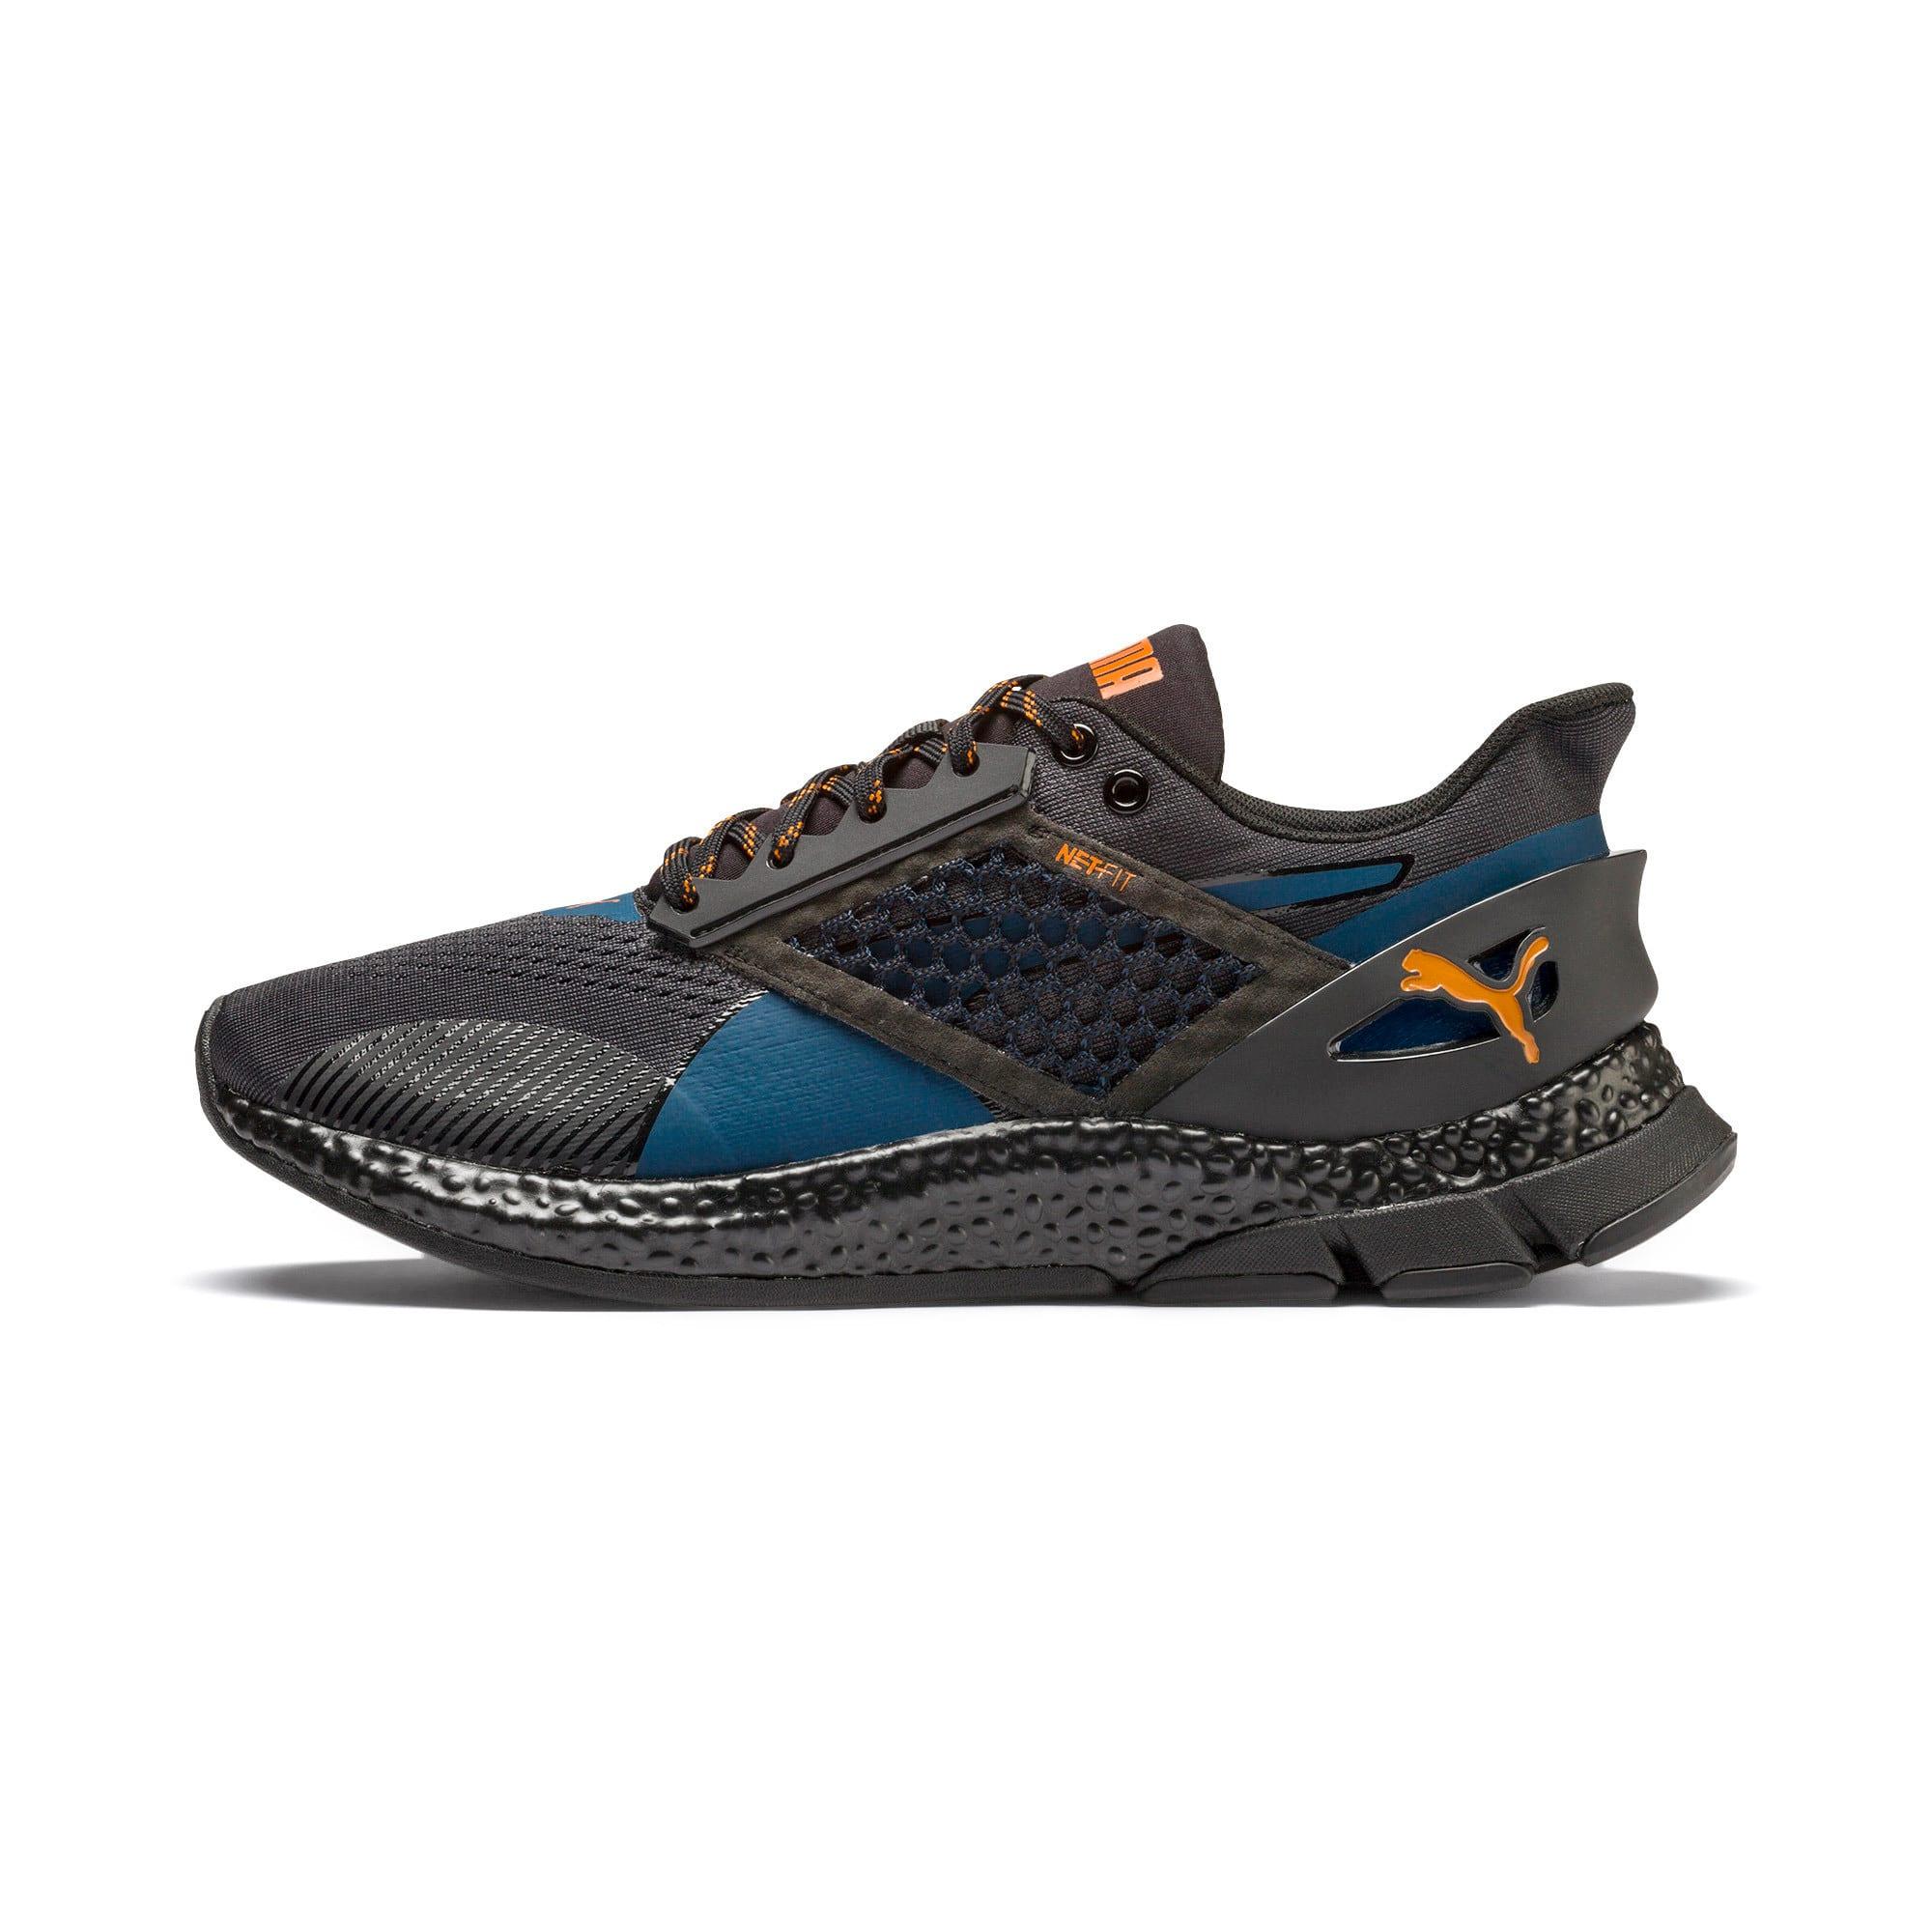 Imagen en miniatura 1 de Zapatillas de running de hombre HYBRID NETFIT Astro, Gibraltar Sea-Puma Black, mediana